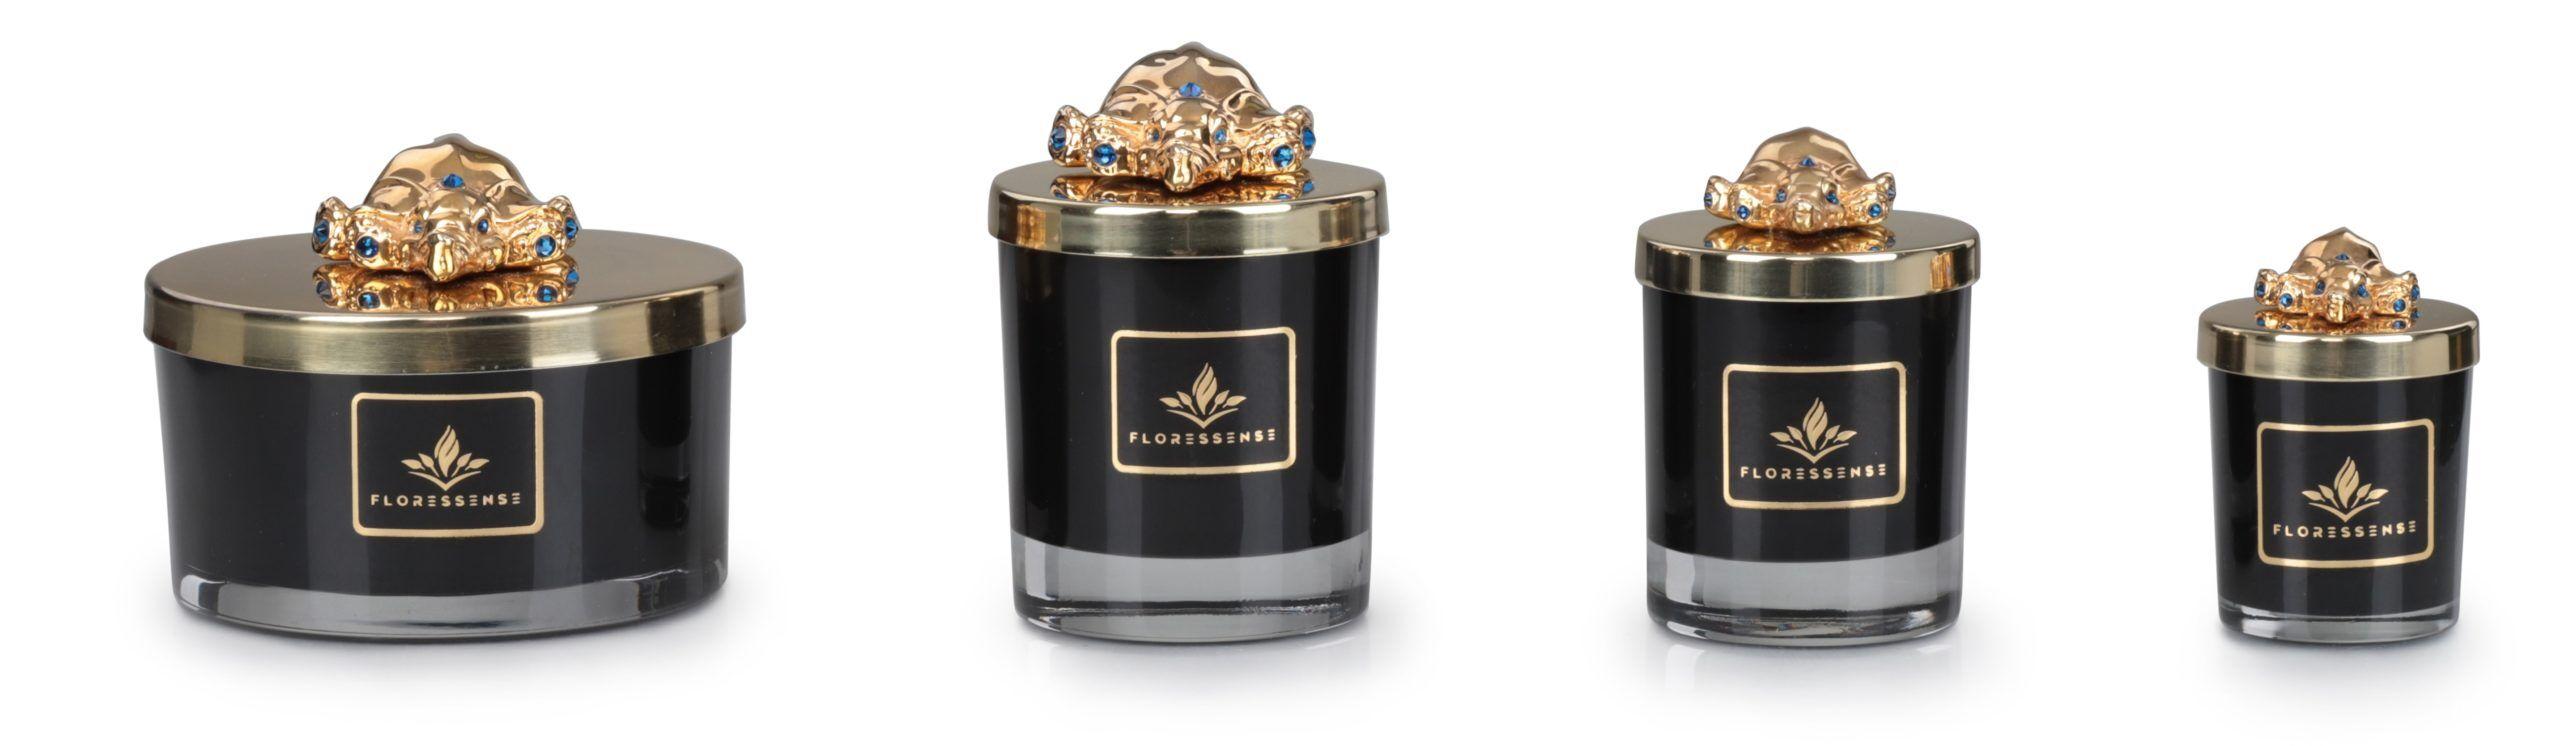 Floressense - bougie bijou luxe - éléphant or